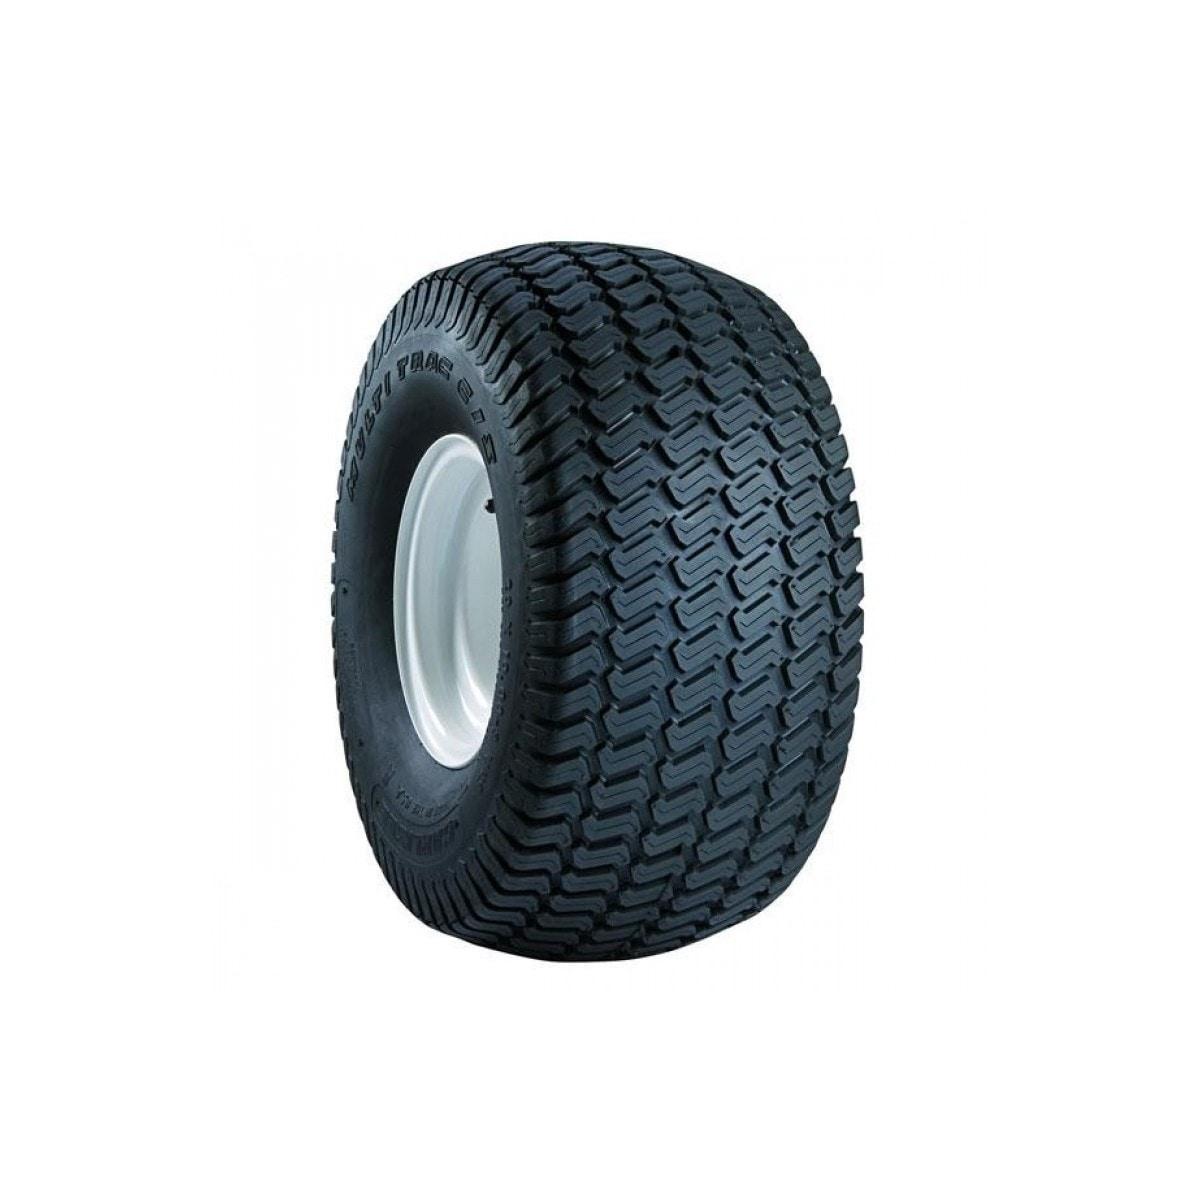 Carlisle Multi Trac CS Lawn & Garden Tire - 26X1200-12 LR...